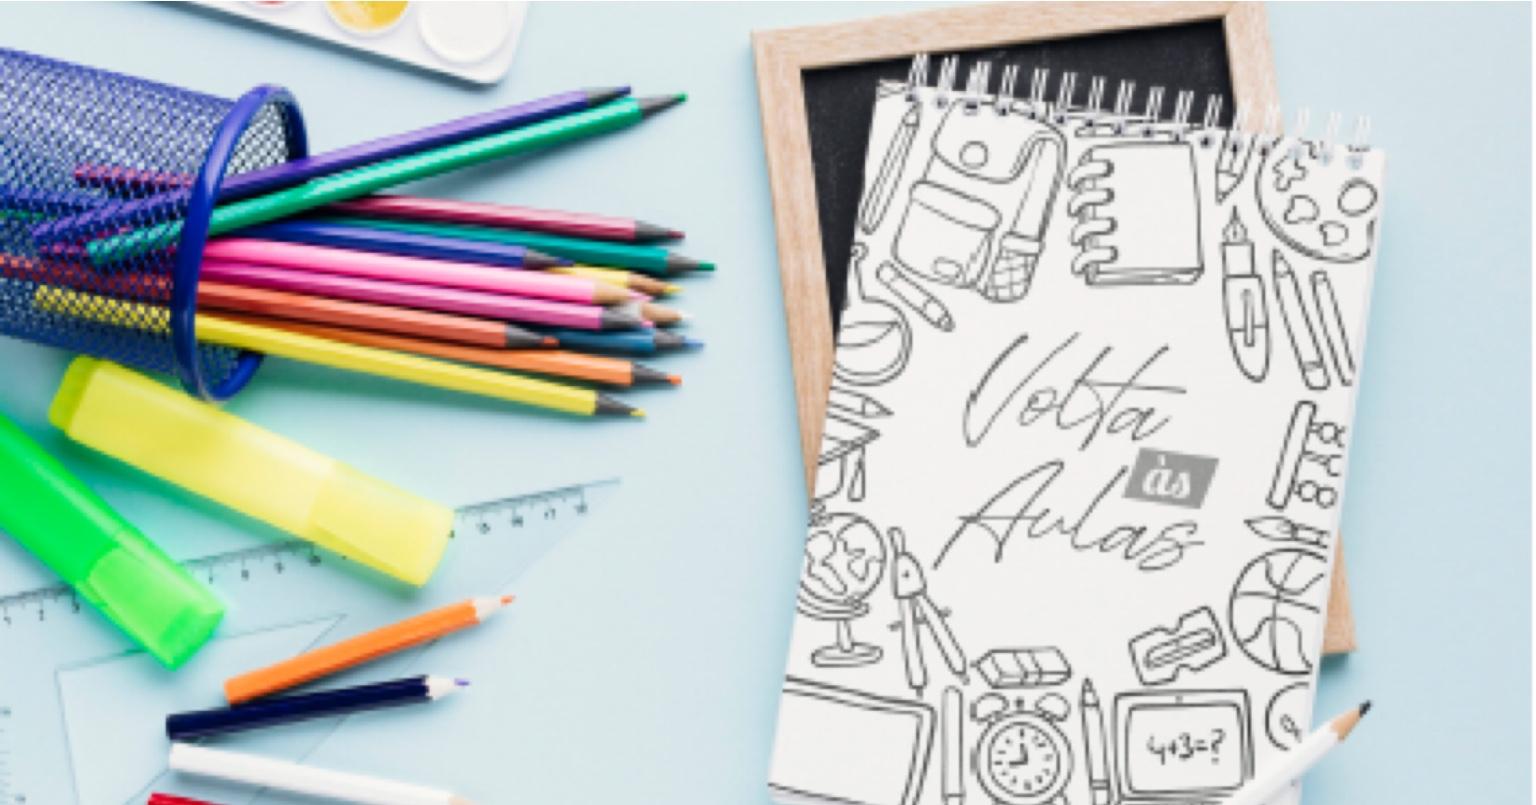 Procon do Distrito Federal atualiza orientações sobre material escolar